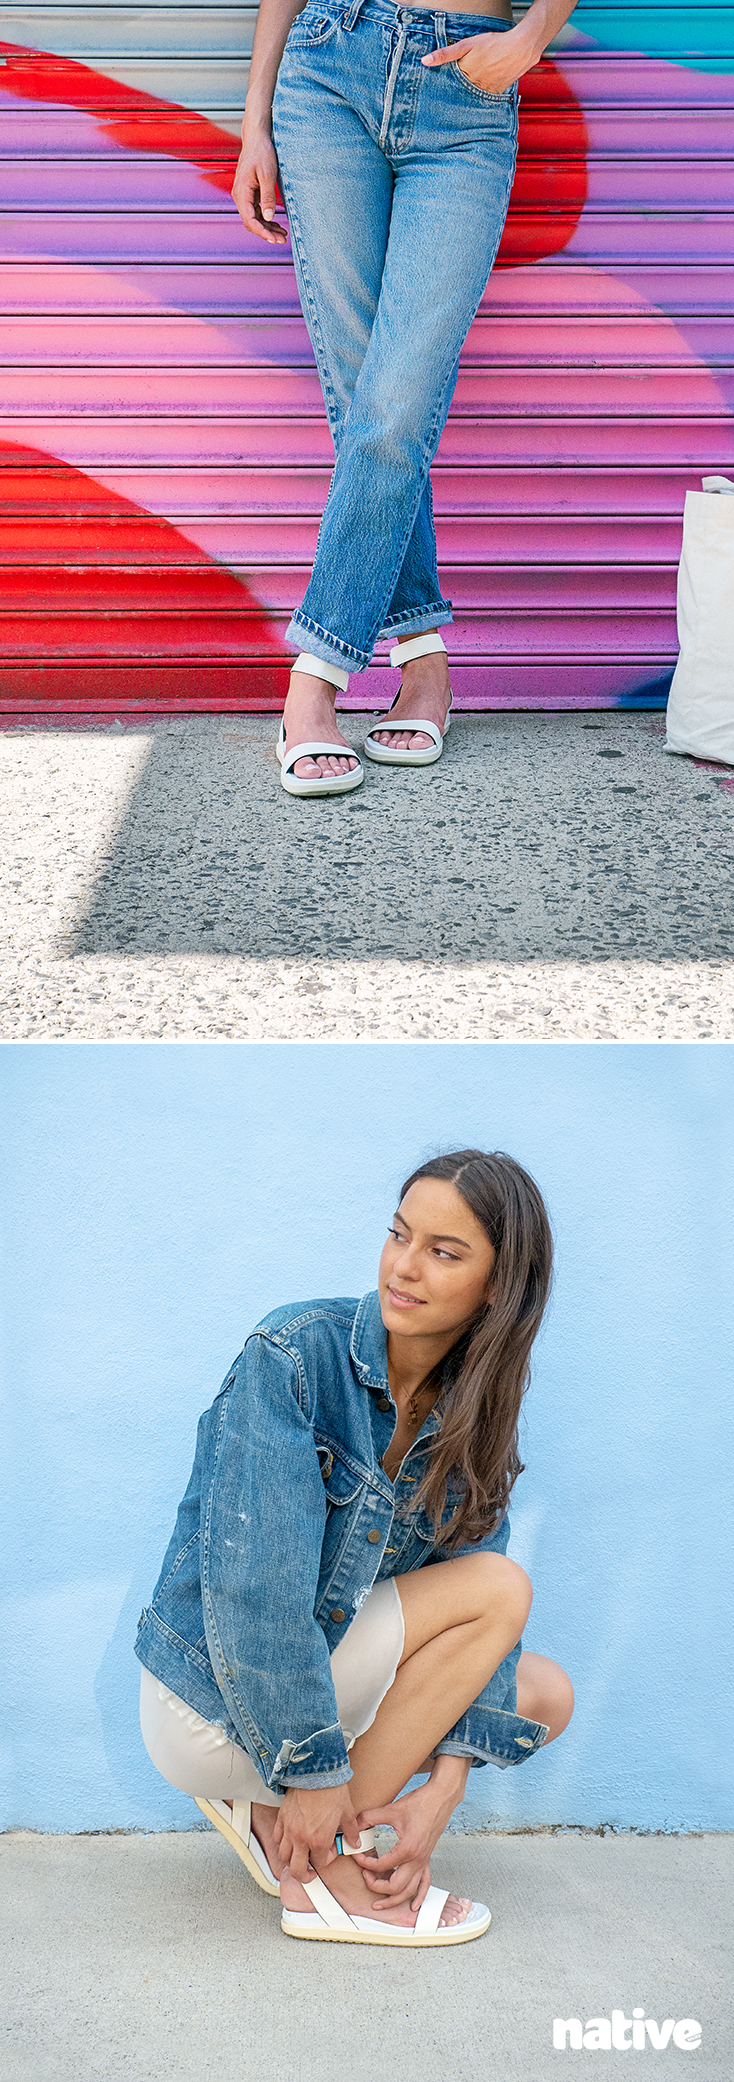 Native Shoes Womens Juliet